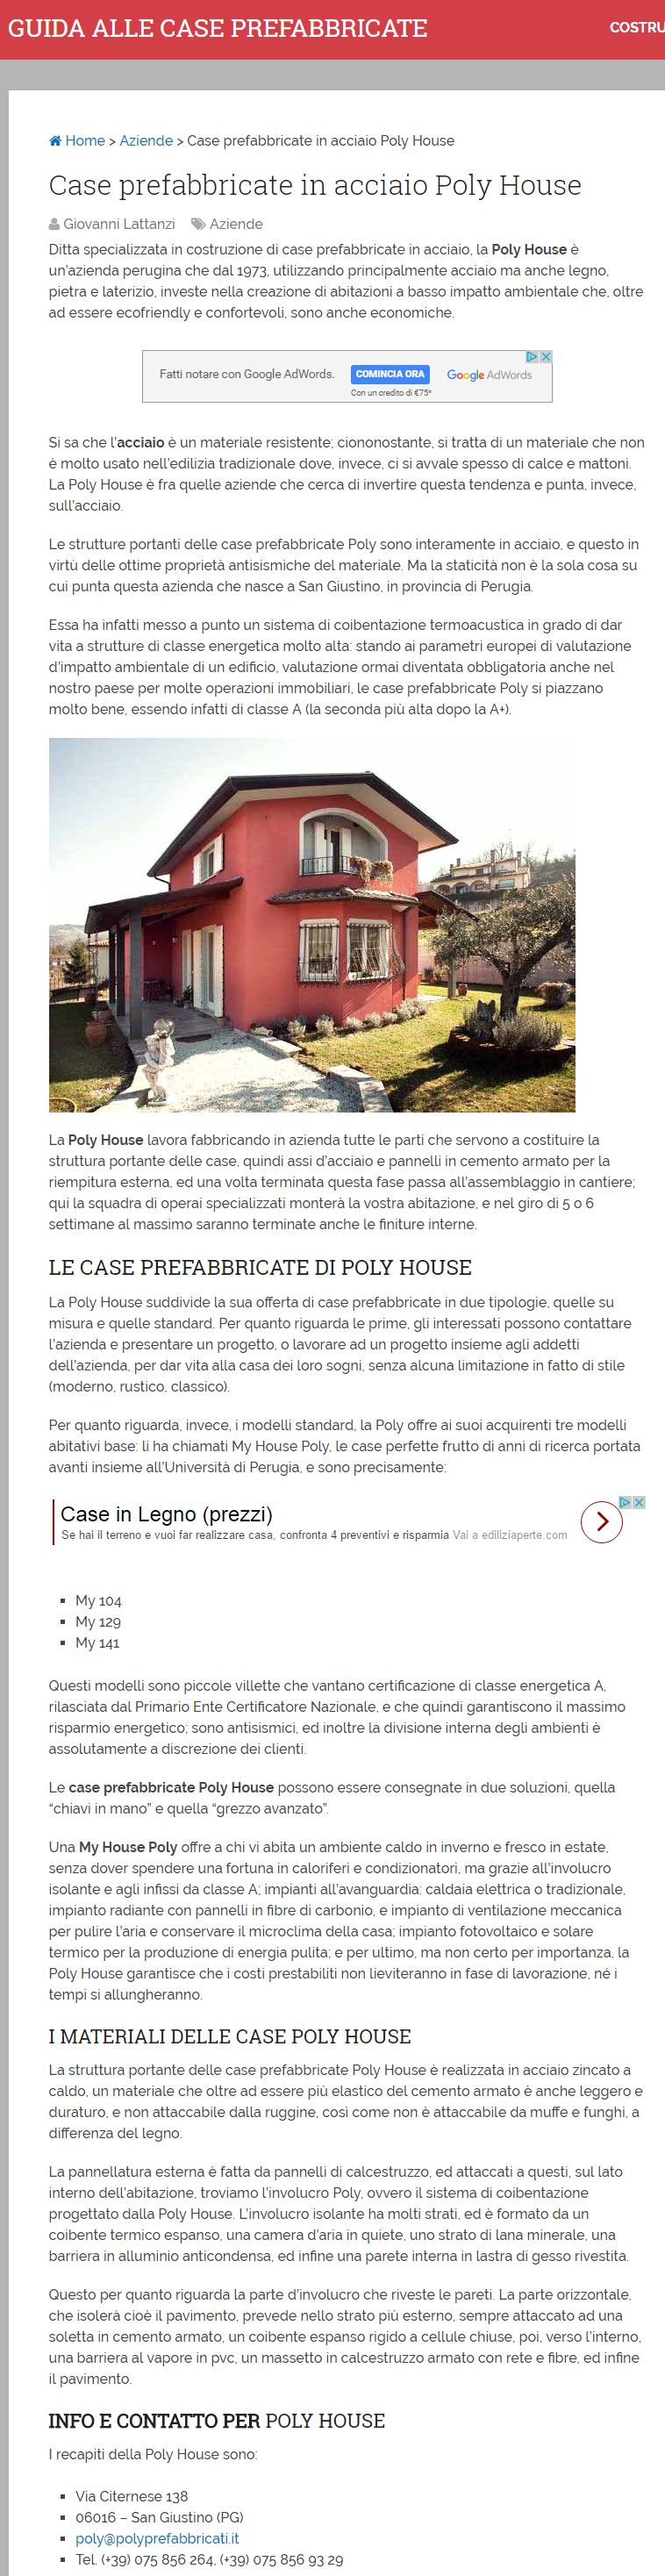 FireShot Capture 24 - Case prefabbricate Poly House_ - http___www.guidacaseprefabbricate.